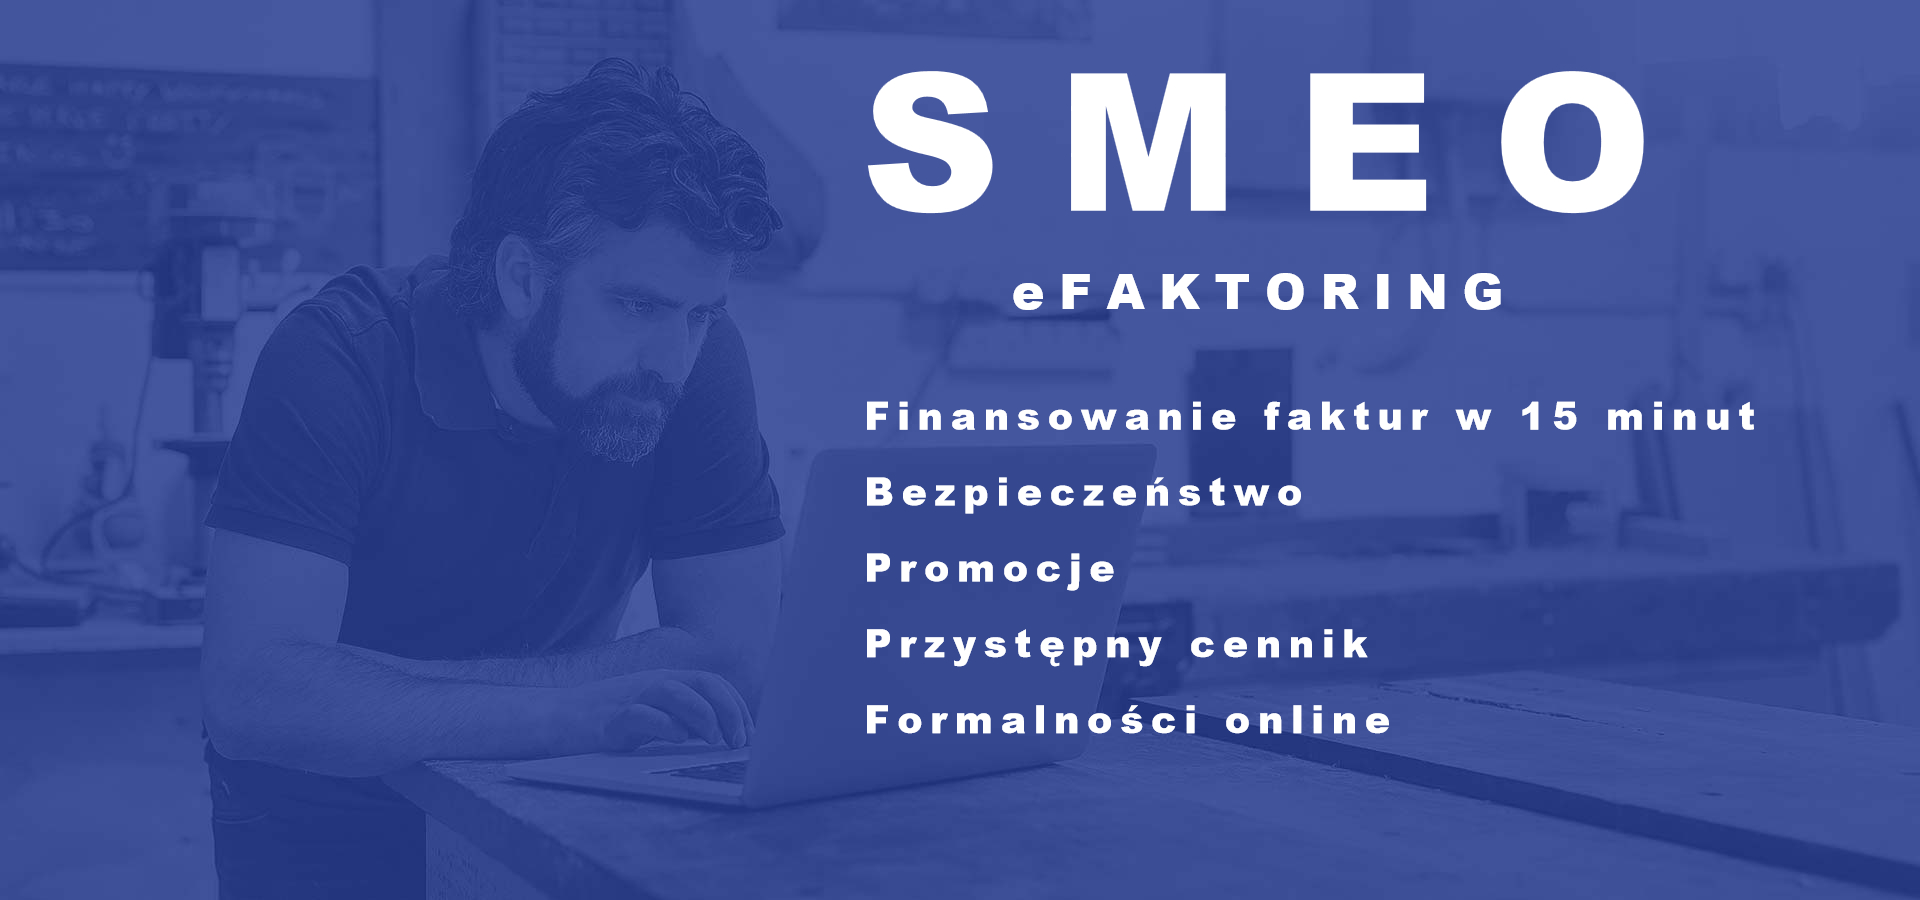 SMEO Faktoring